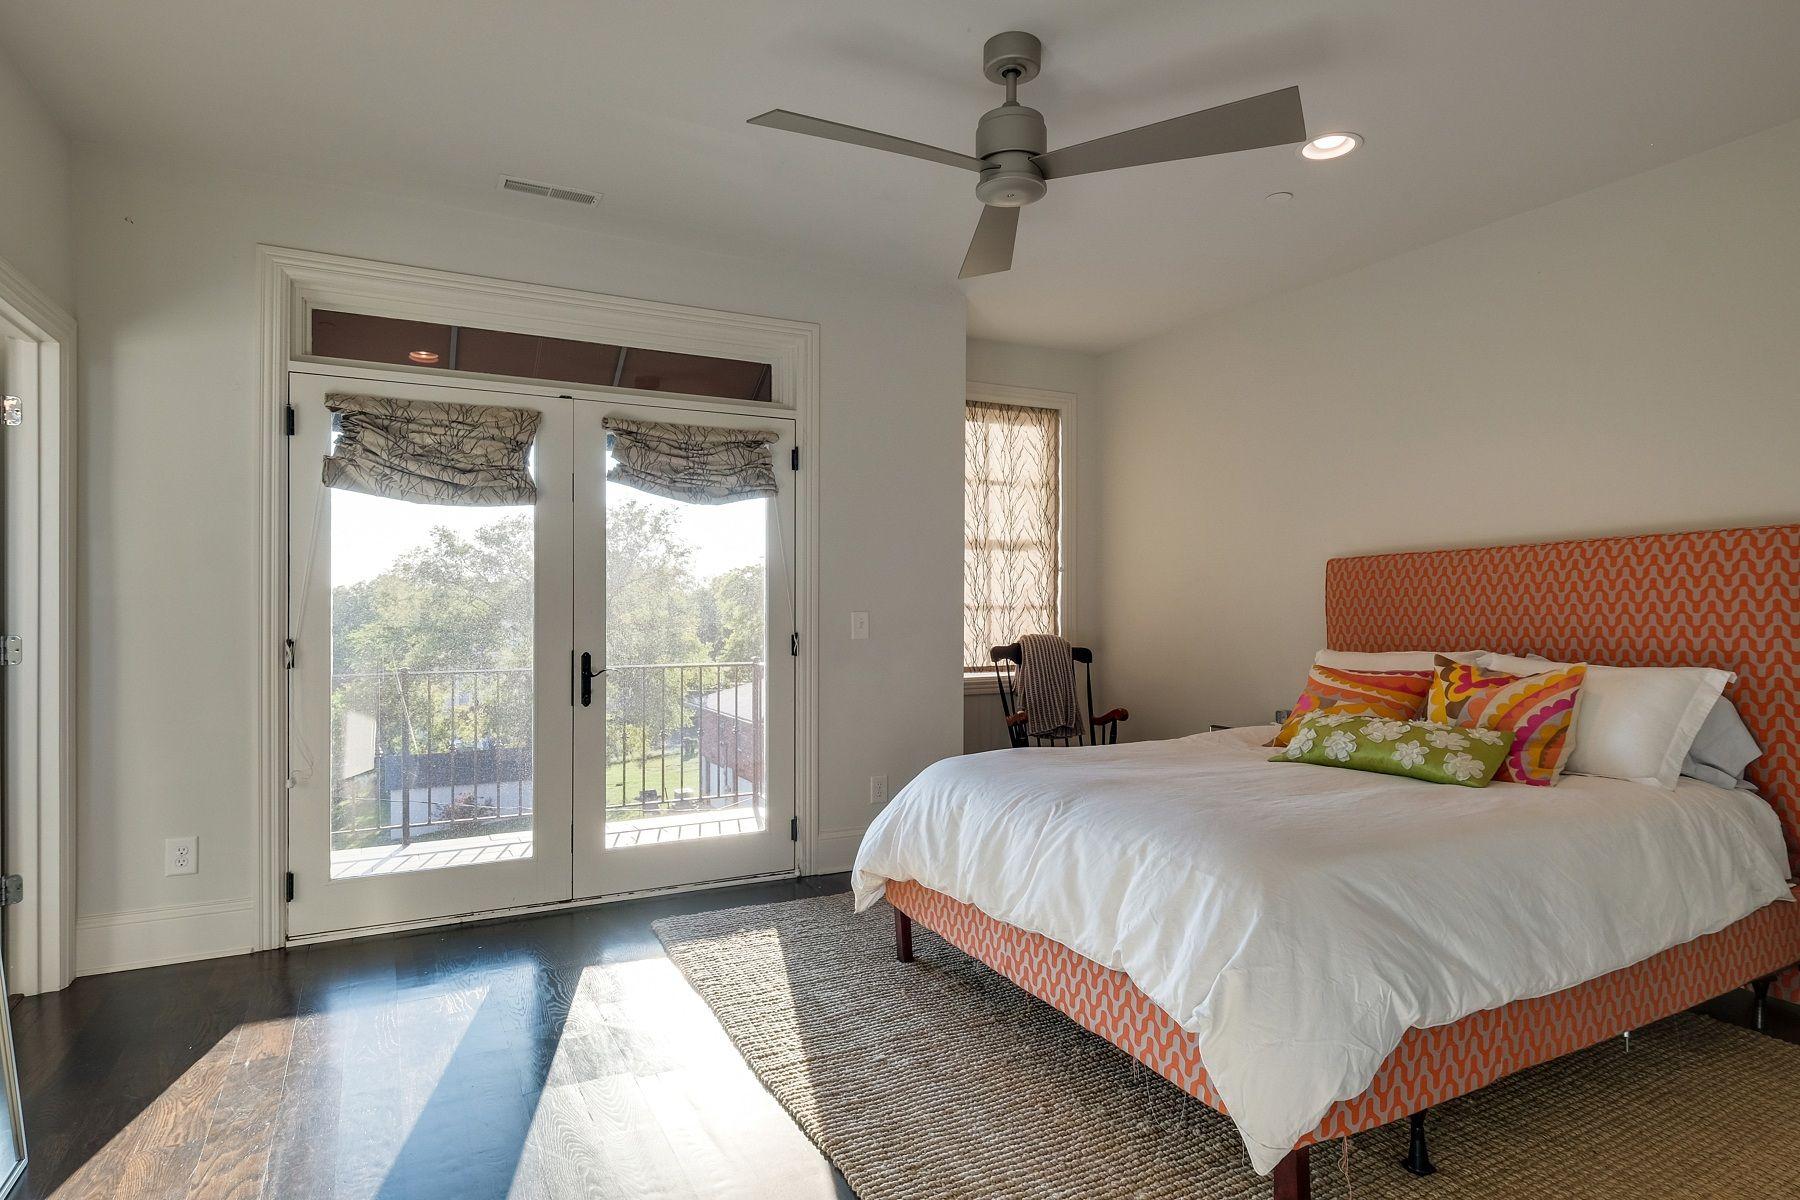 Master bedroom wardrobe designs inside  This CustomBuilt Townhome Features  Stories of Luxury  Bedroom